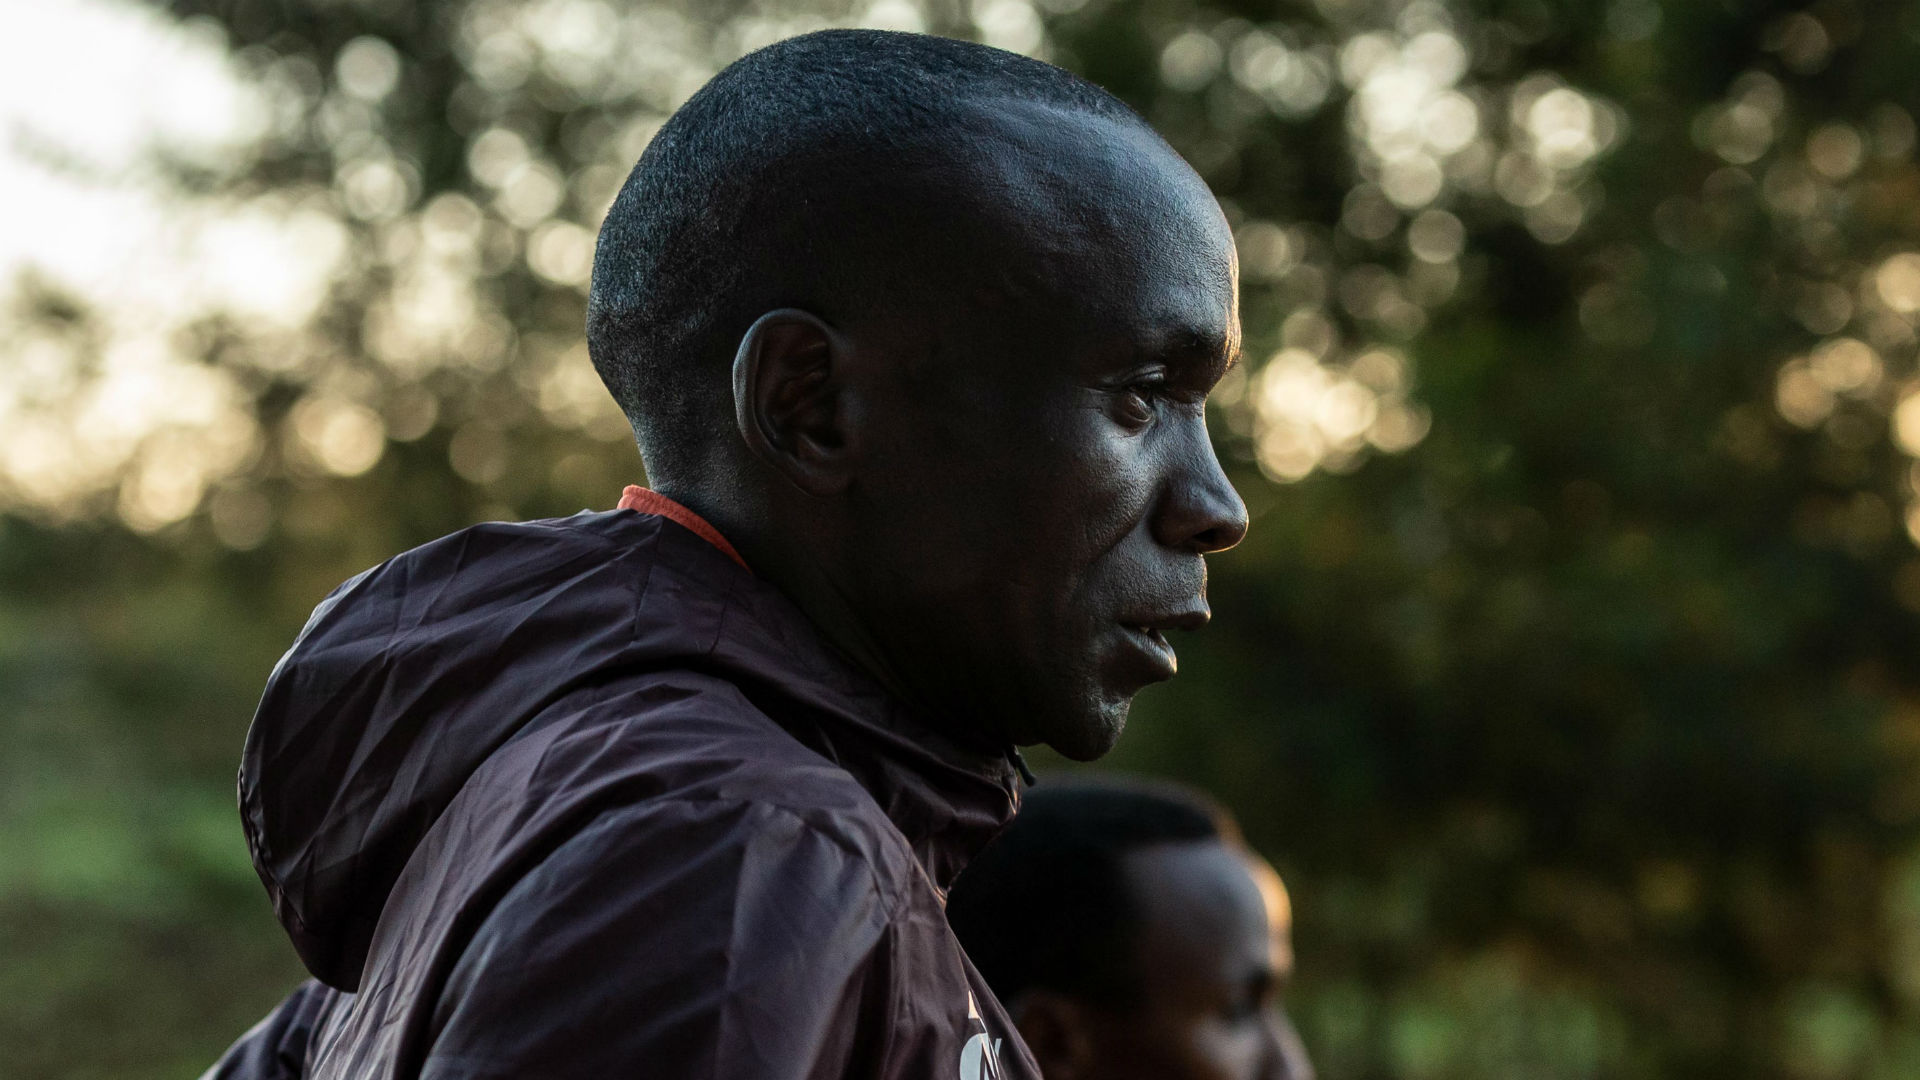 Eliud Kipchoge marathon world record attempt: What is the INEOS 1:59 Challenge?